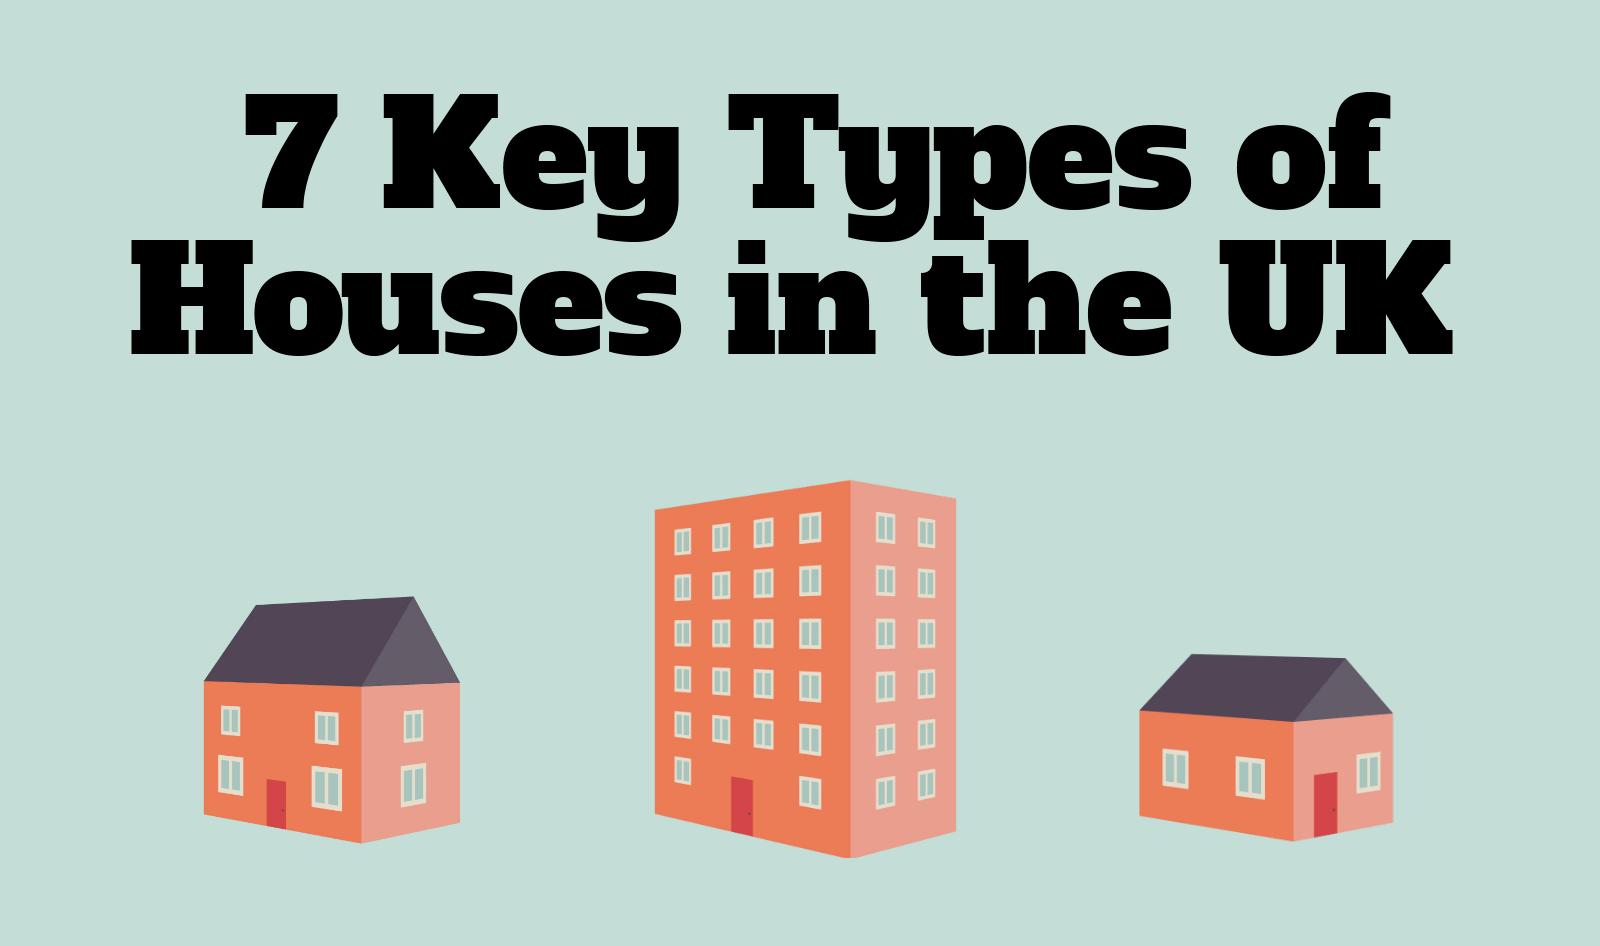 7 key types of